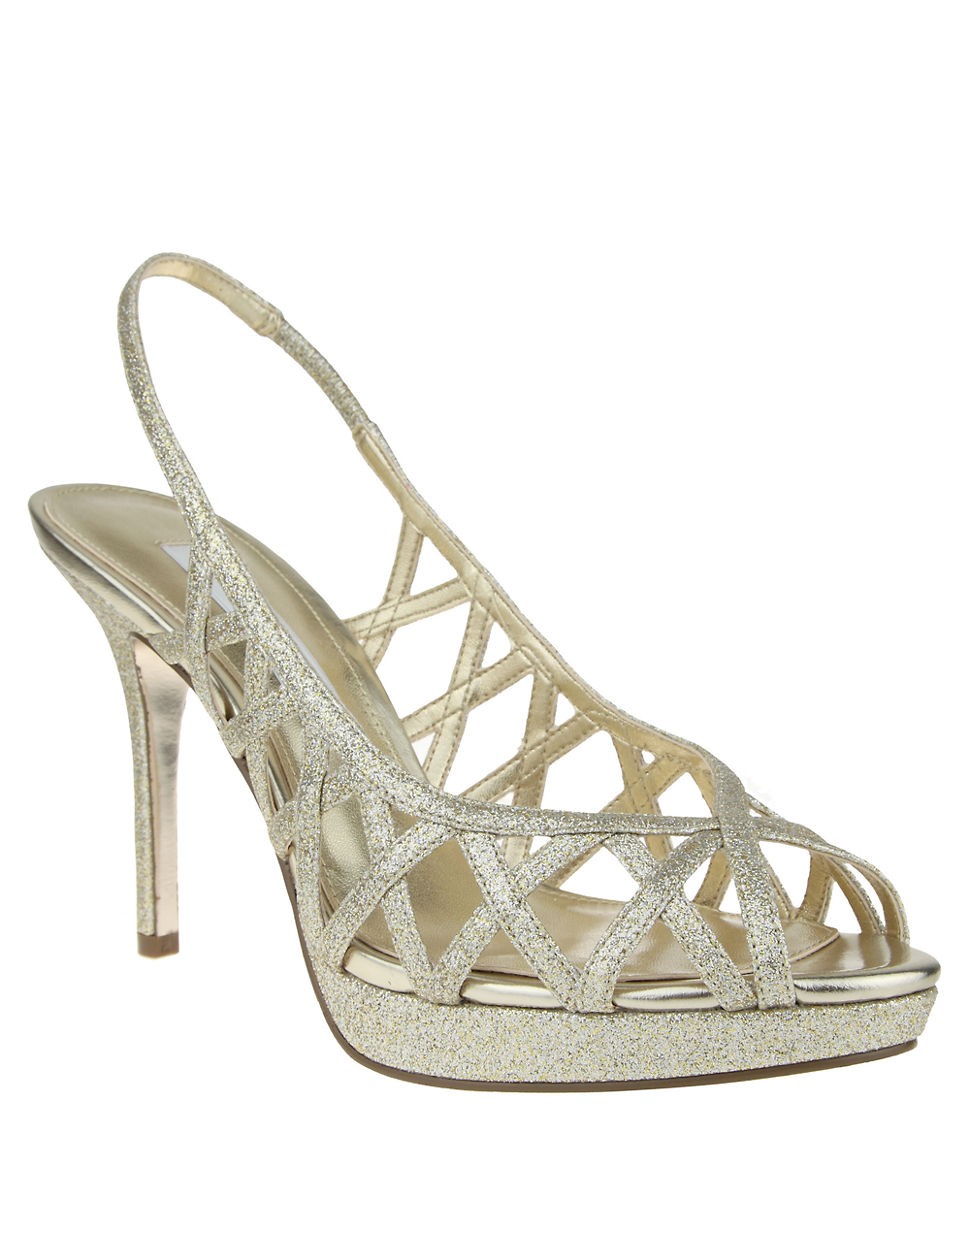 a89c71e966e8 Lyst - Nina Fantina Glitter Peep-toe Slingback Sandals in Metallic